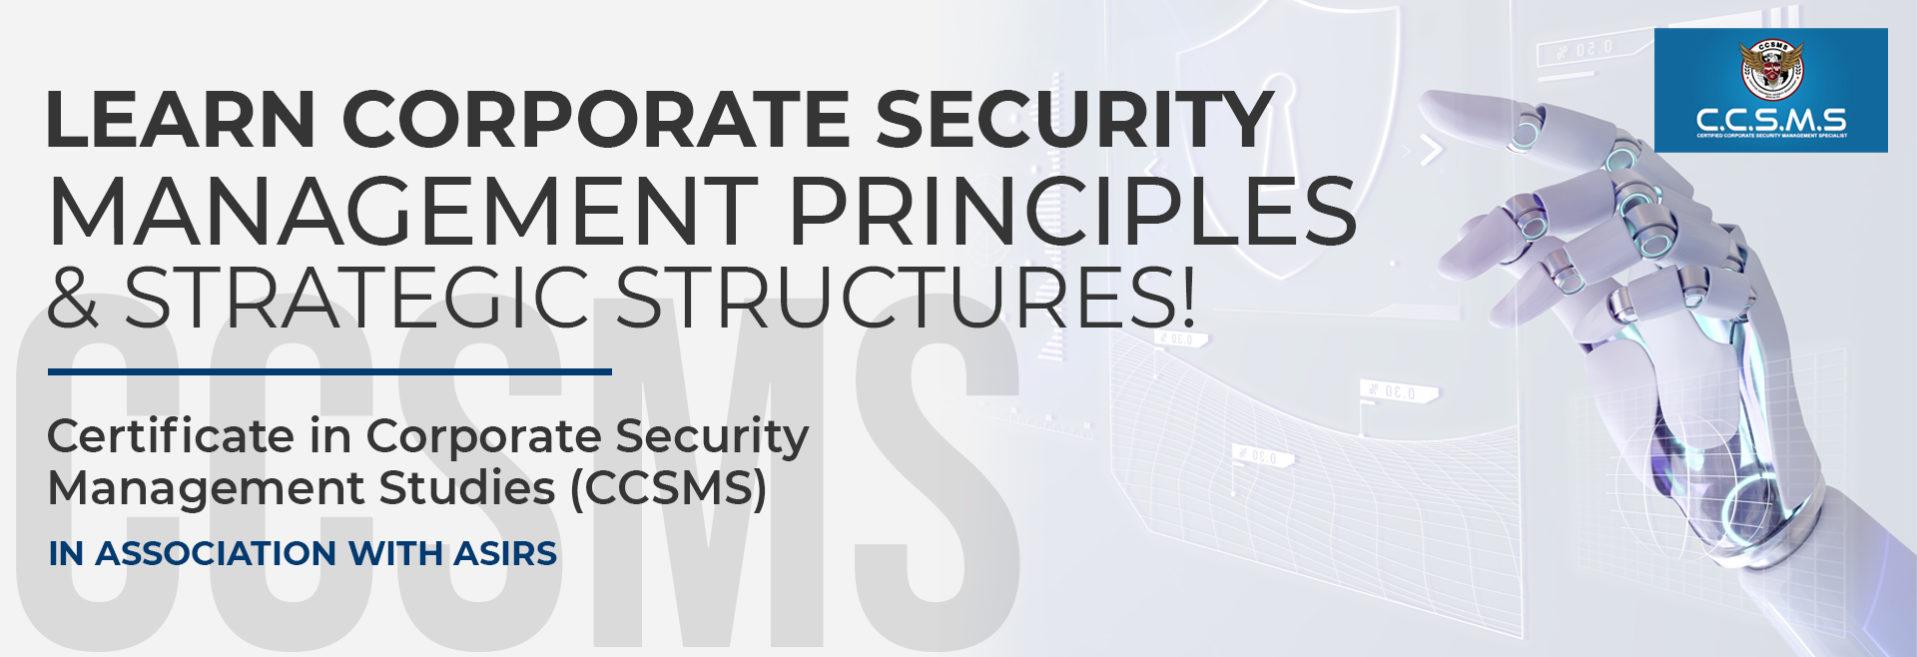 CCSMS_Website Banner_1920,658 copy